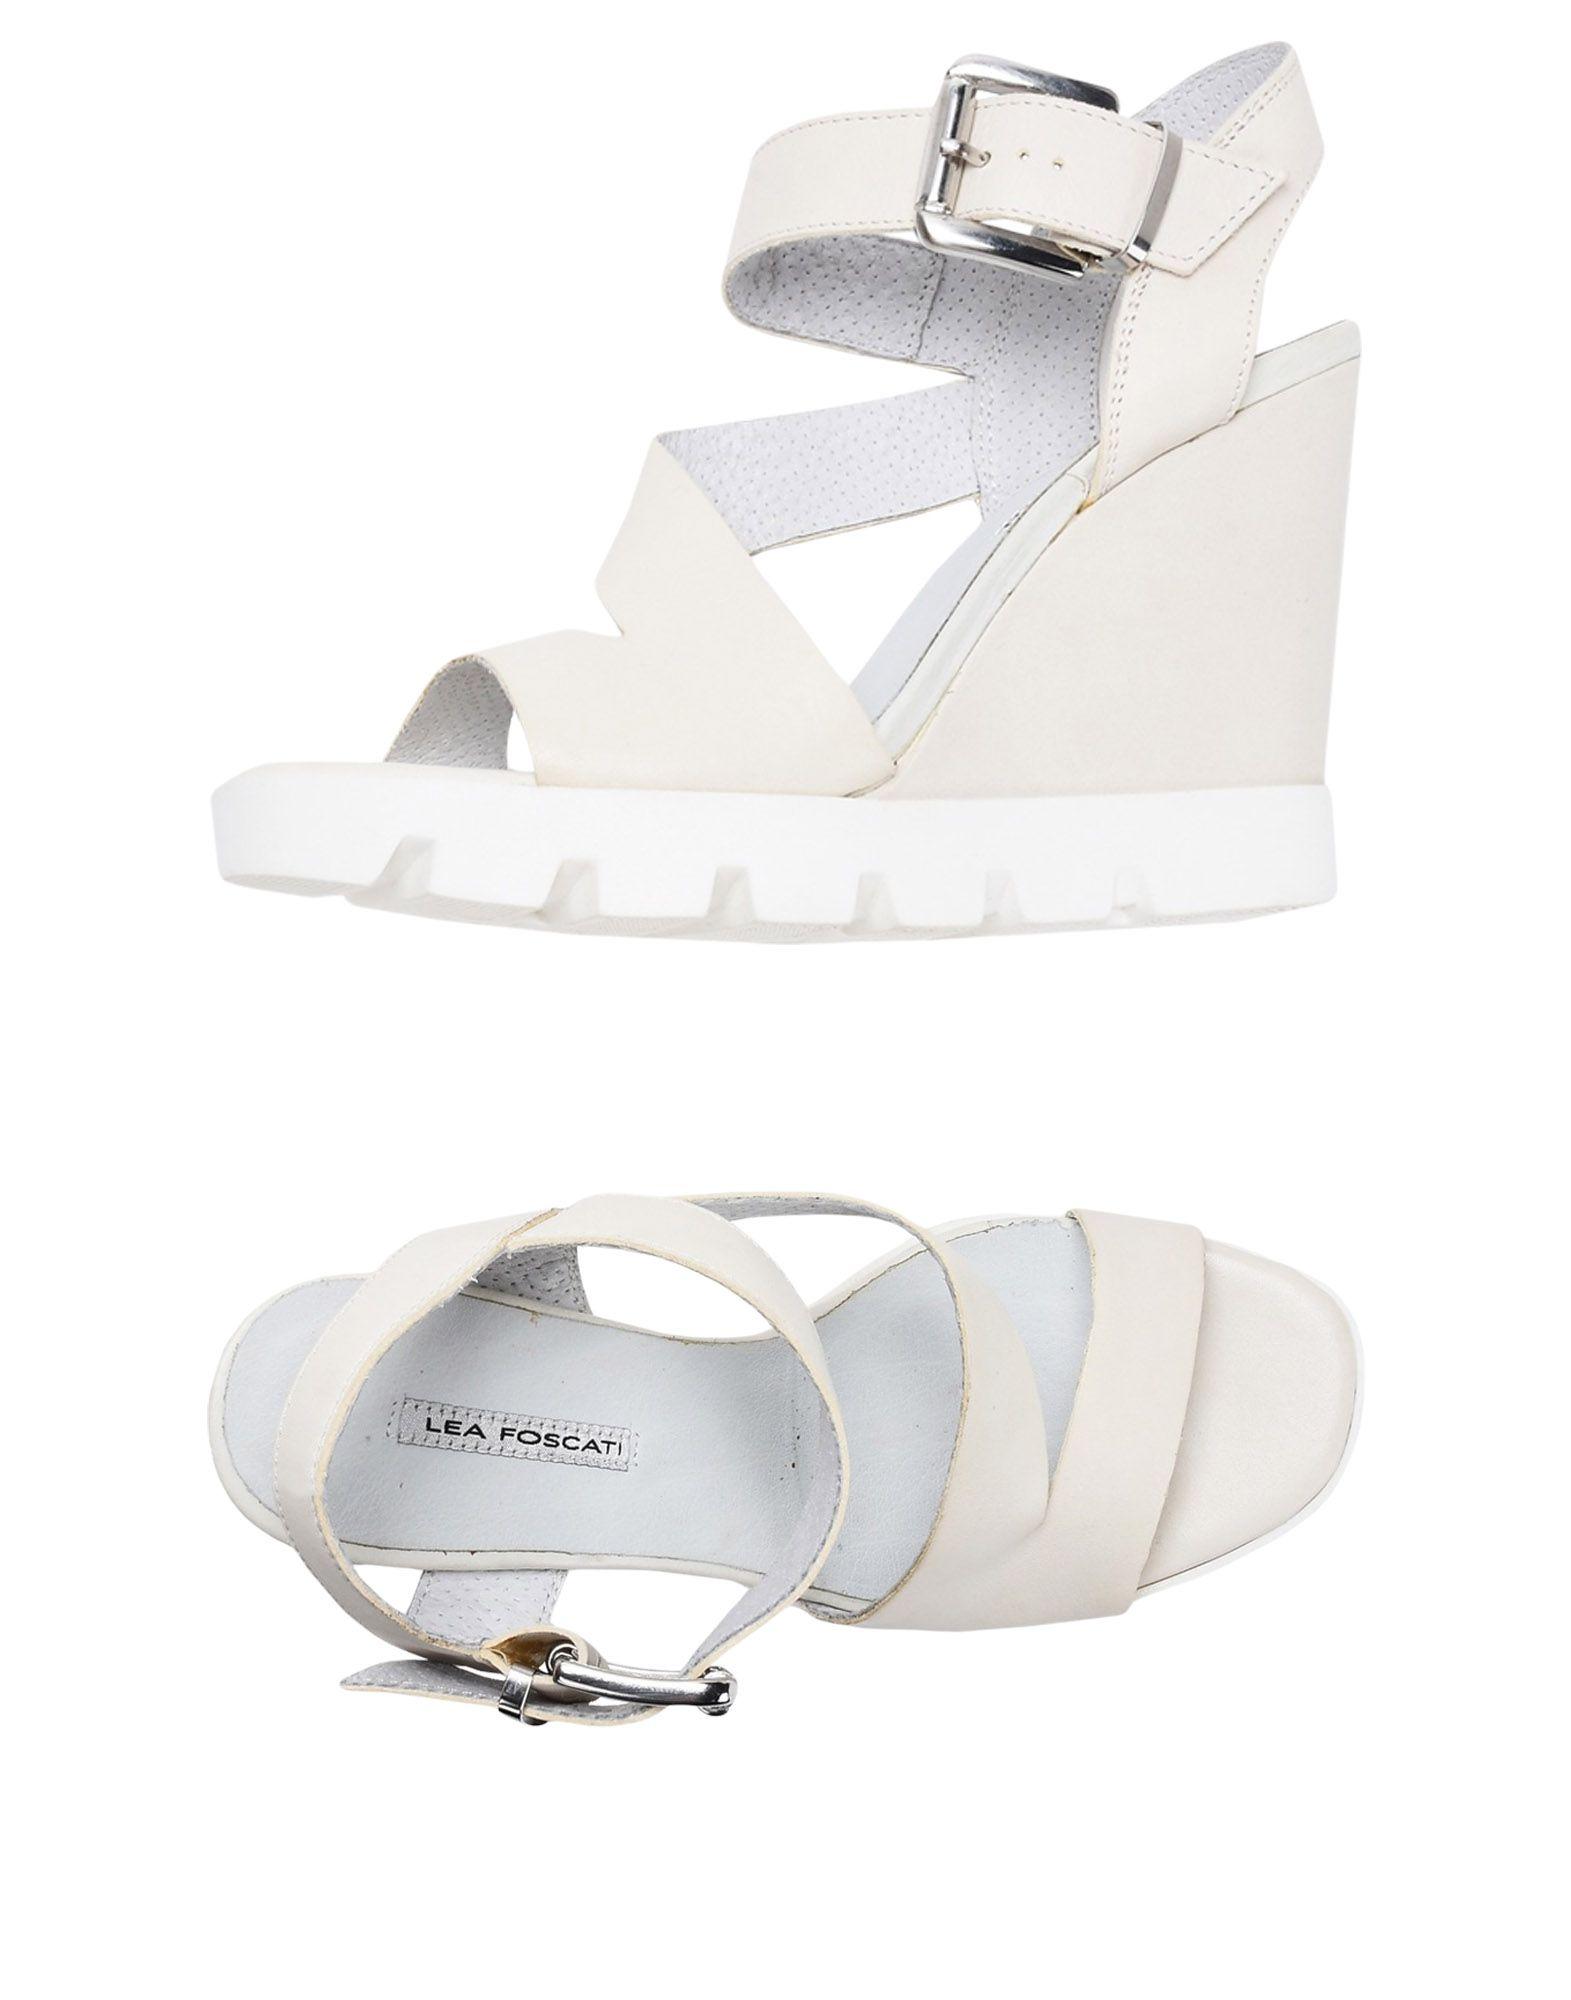 Lea Foscati Sandalen Damen  11251272FL Gute Qualität beliebte Schuhe